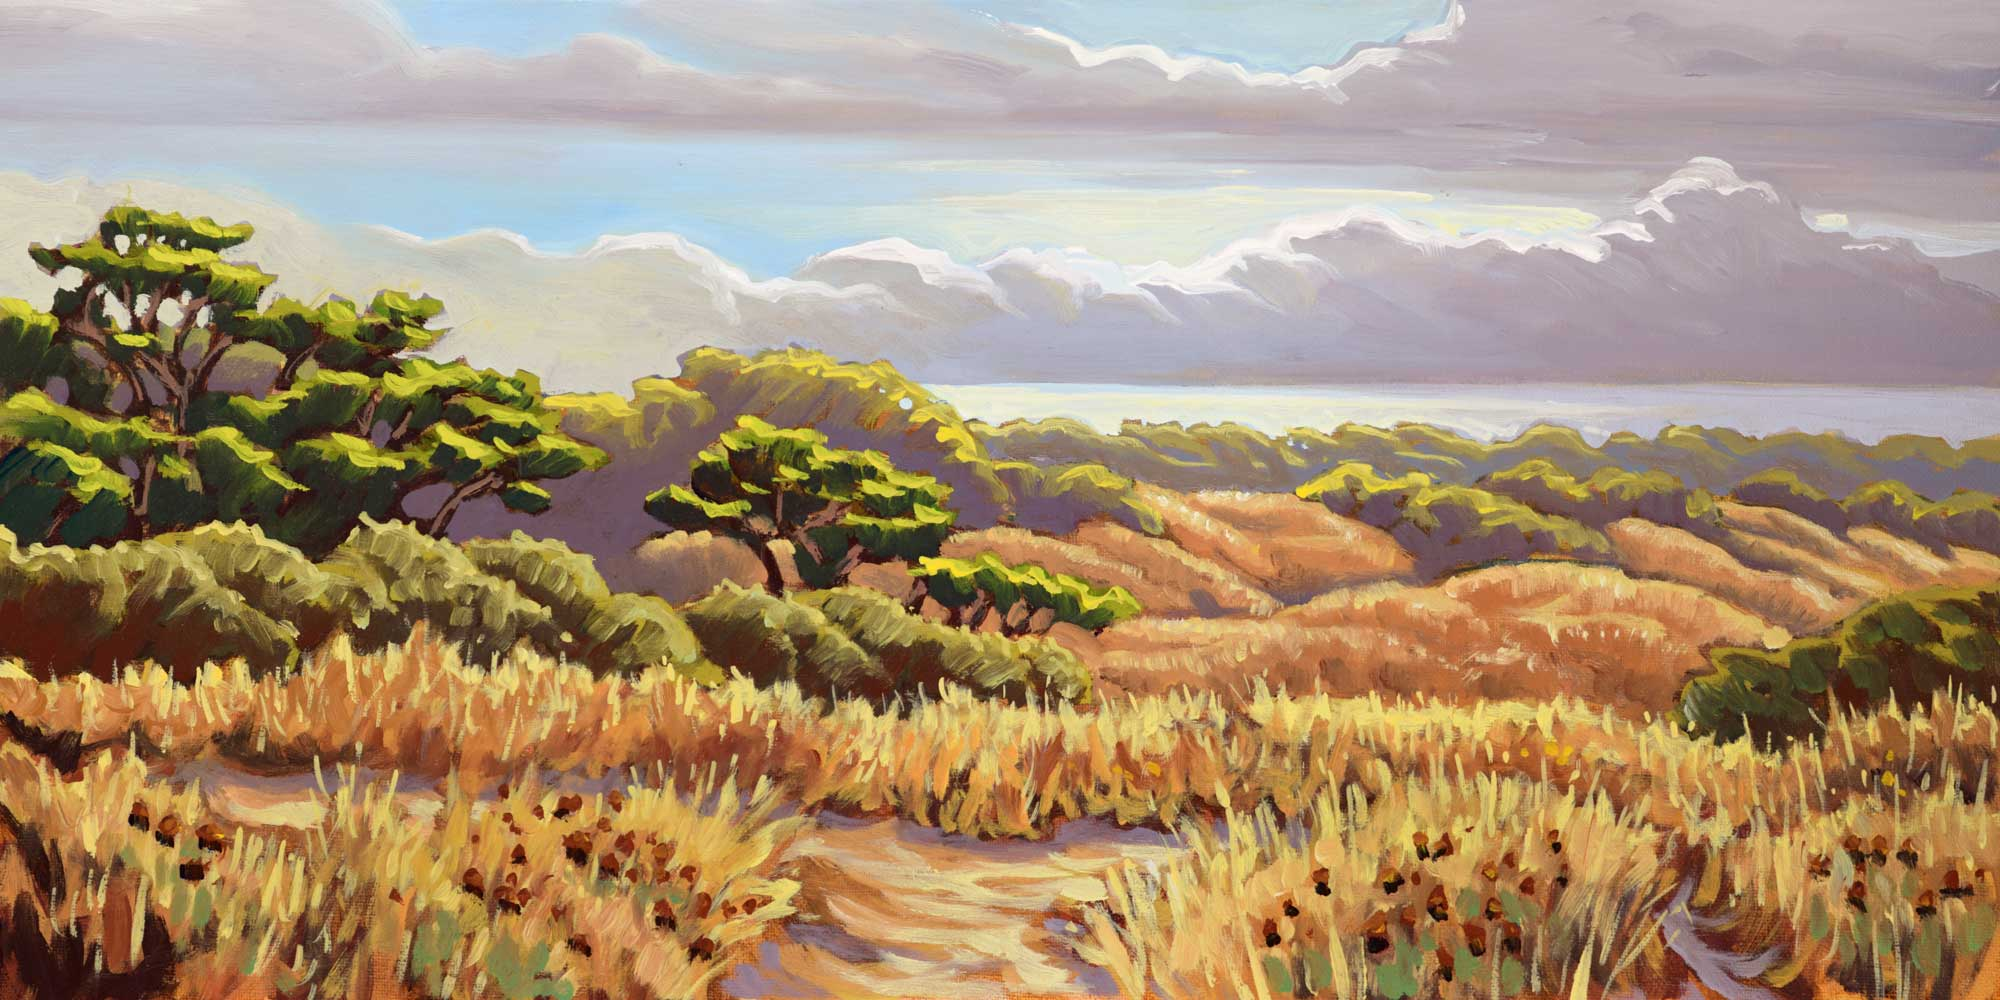 Plein air artwork from the Manila Dunes on the samoa peninsula on the humboldt coast of Northern California